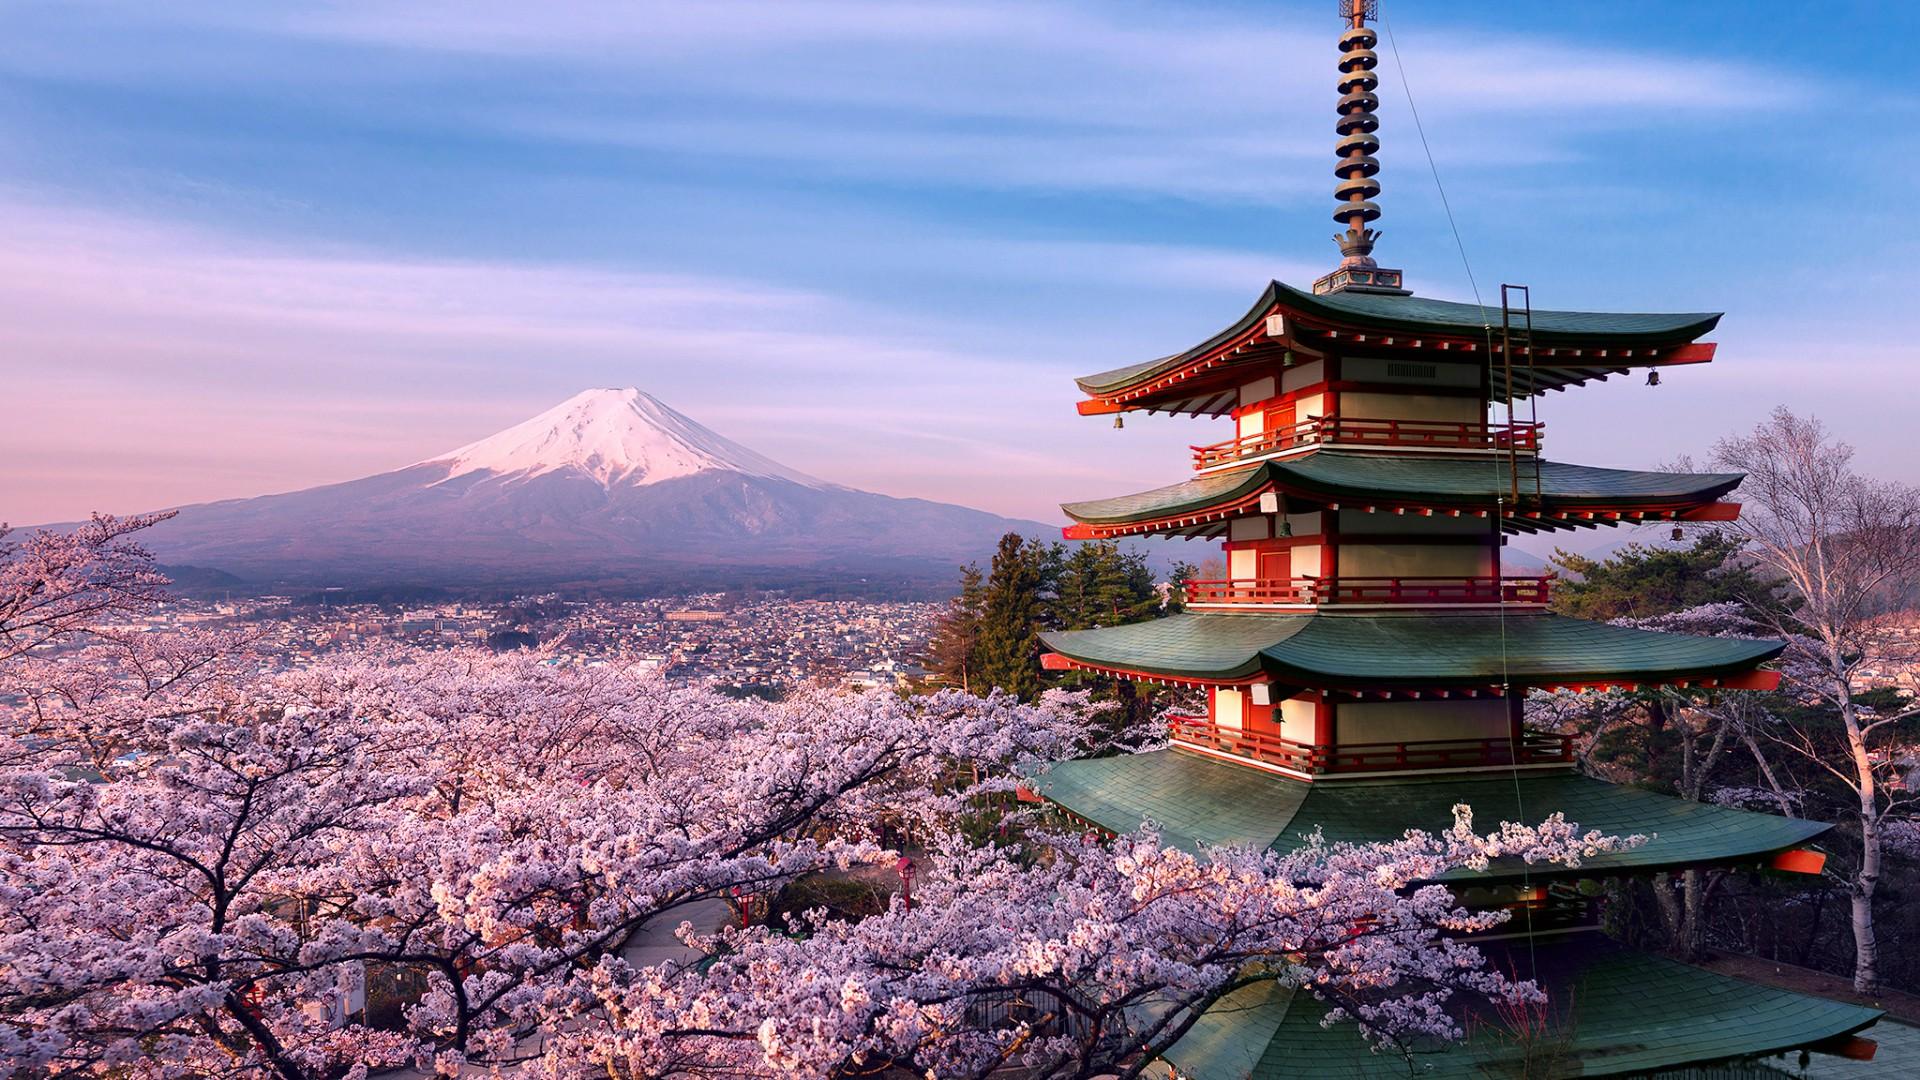 Mount Fuji volcano and Chureito Pagoda wallpaper